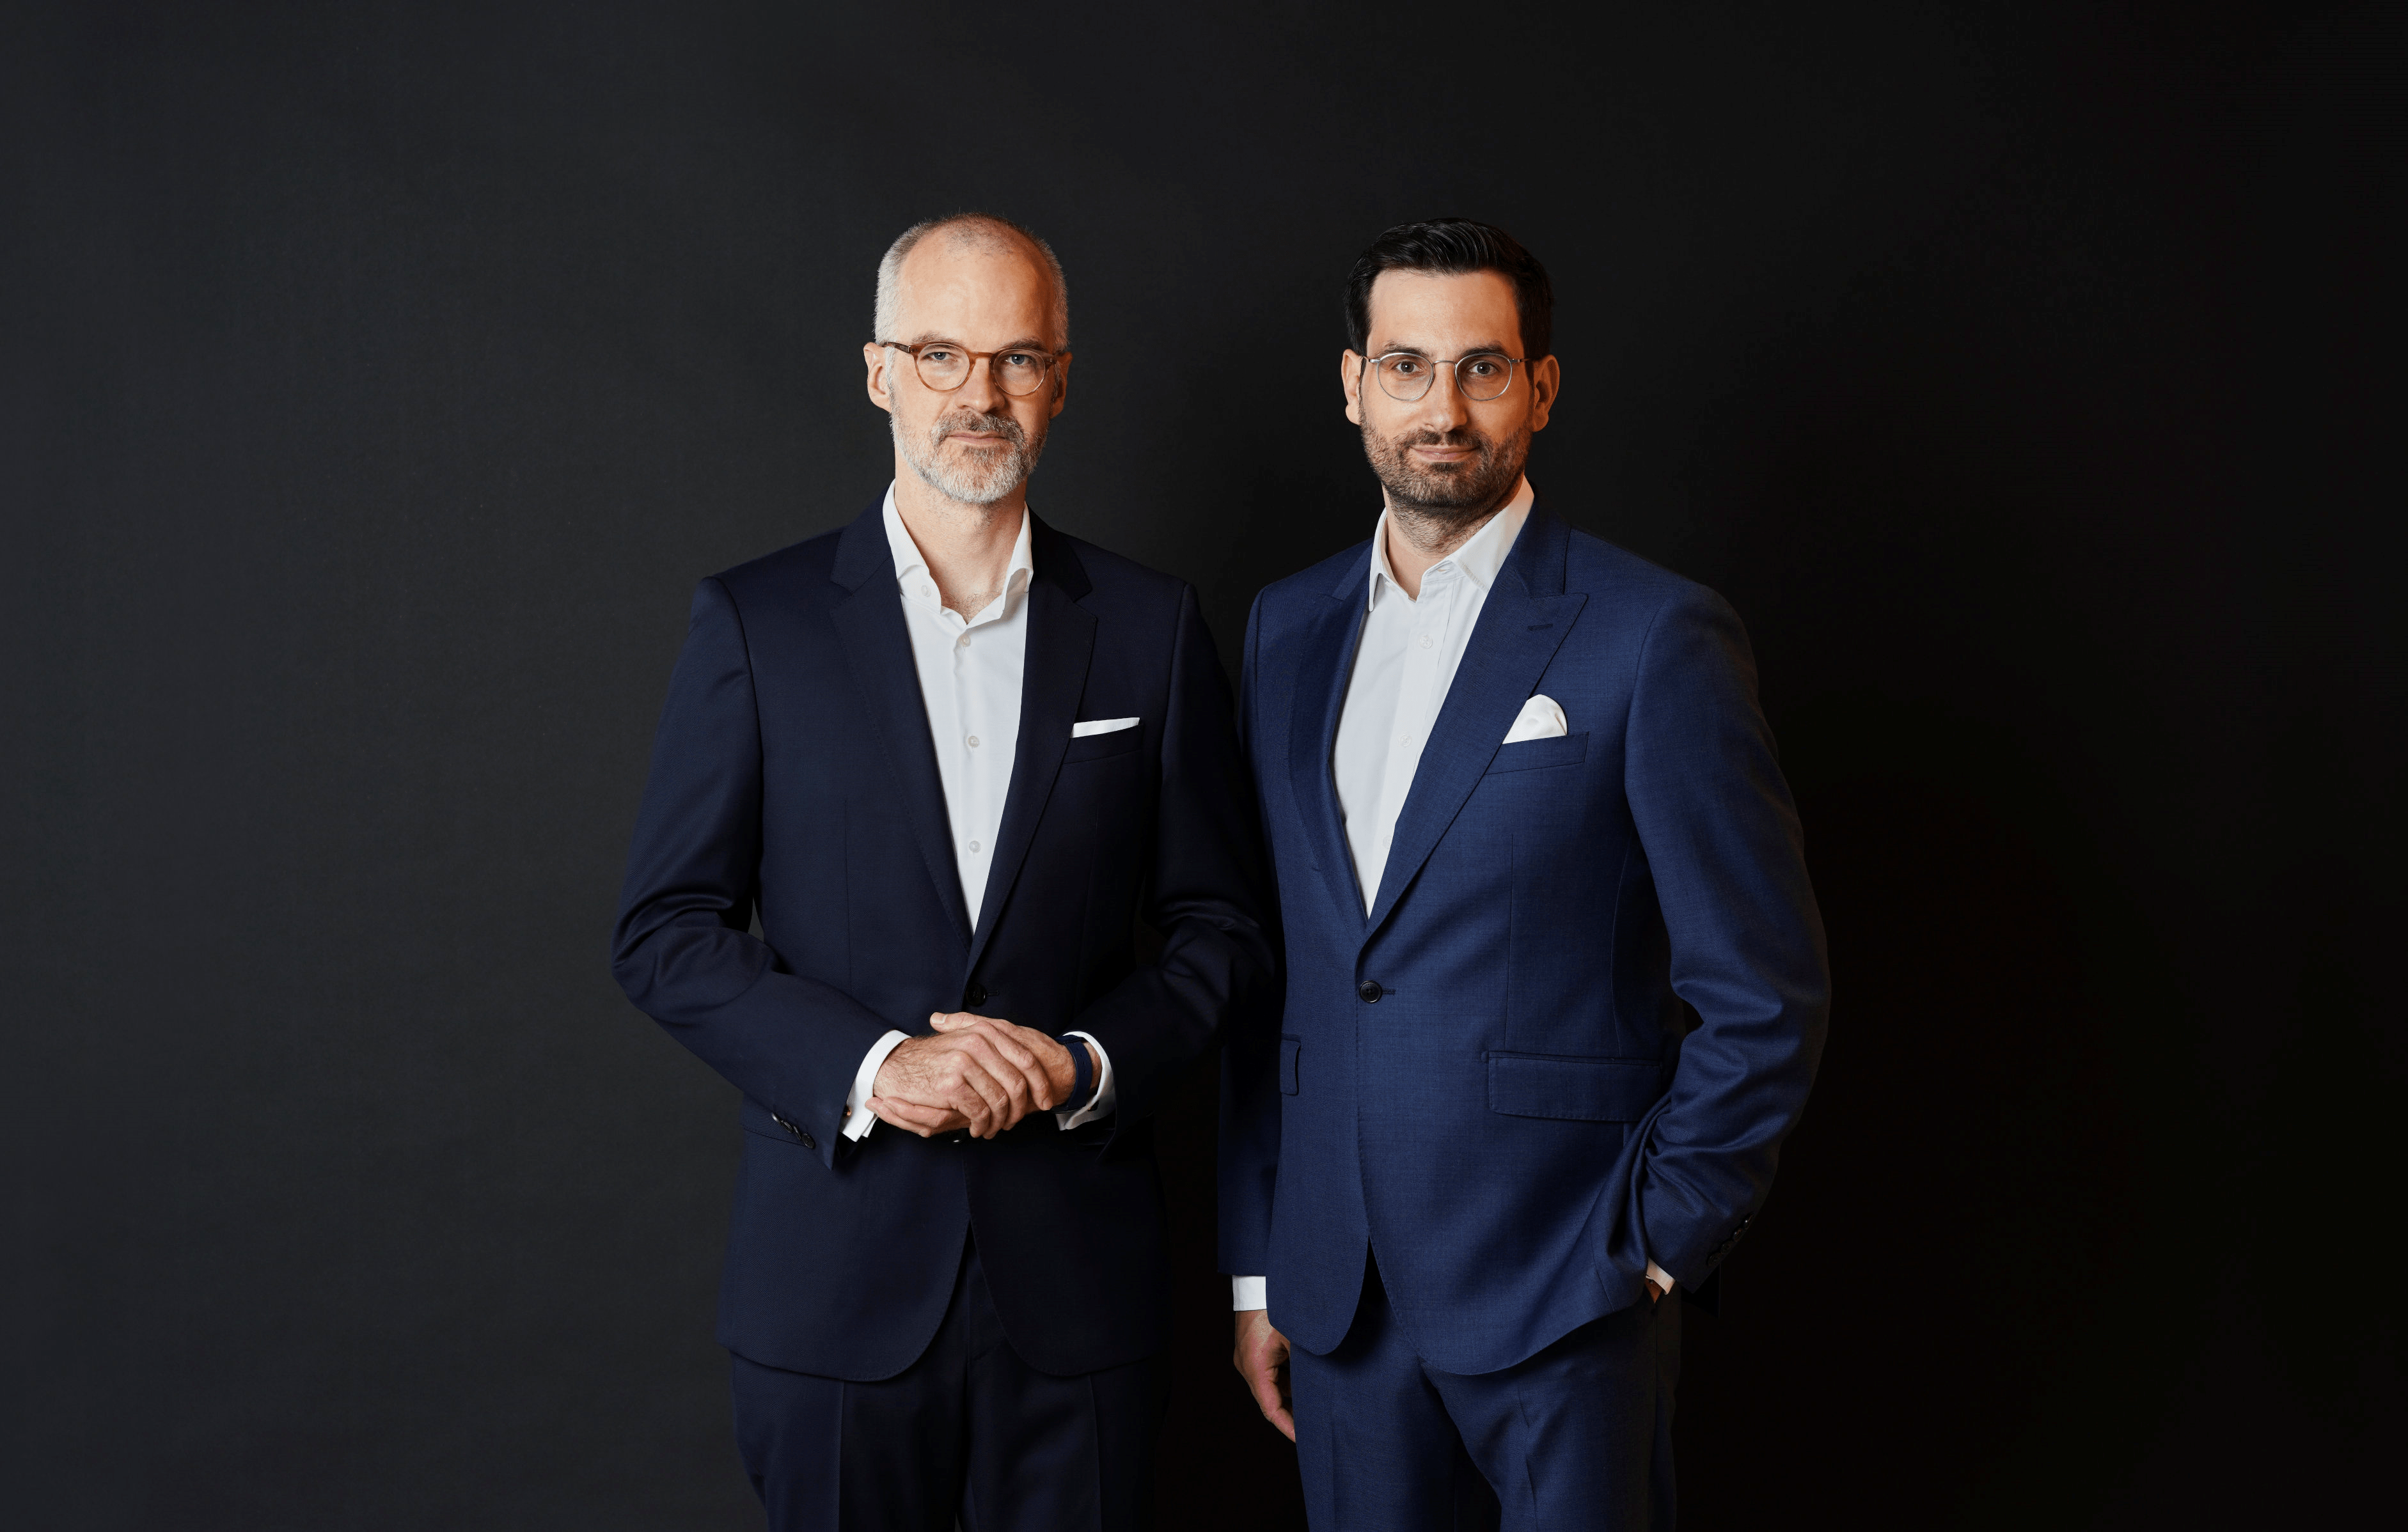 Dr. Reto Batzel & Dr. Georg Schmittmann MARCK_Copyright by Hartmut